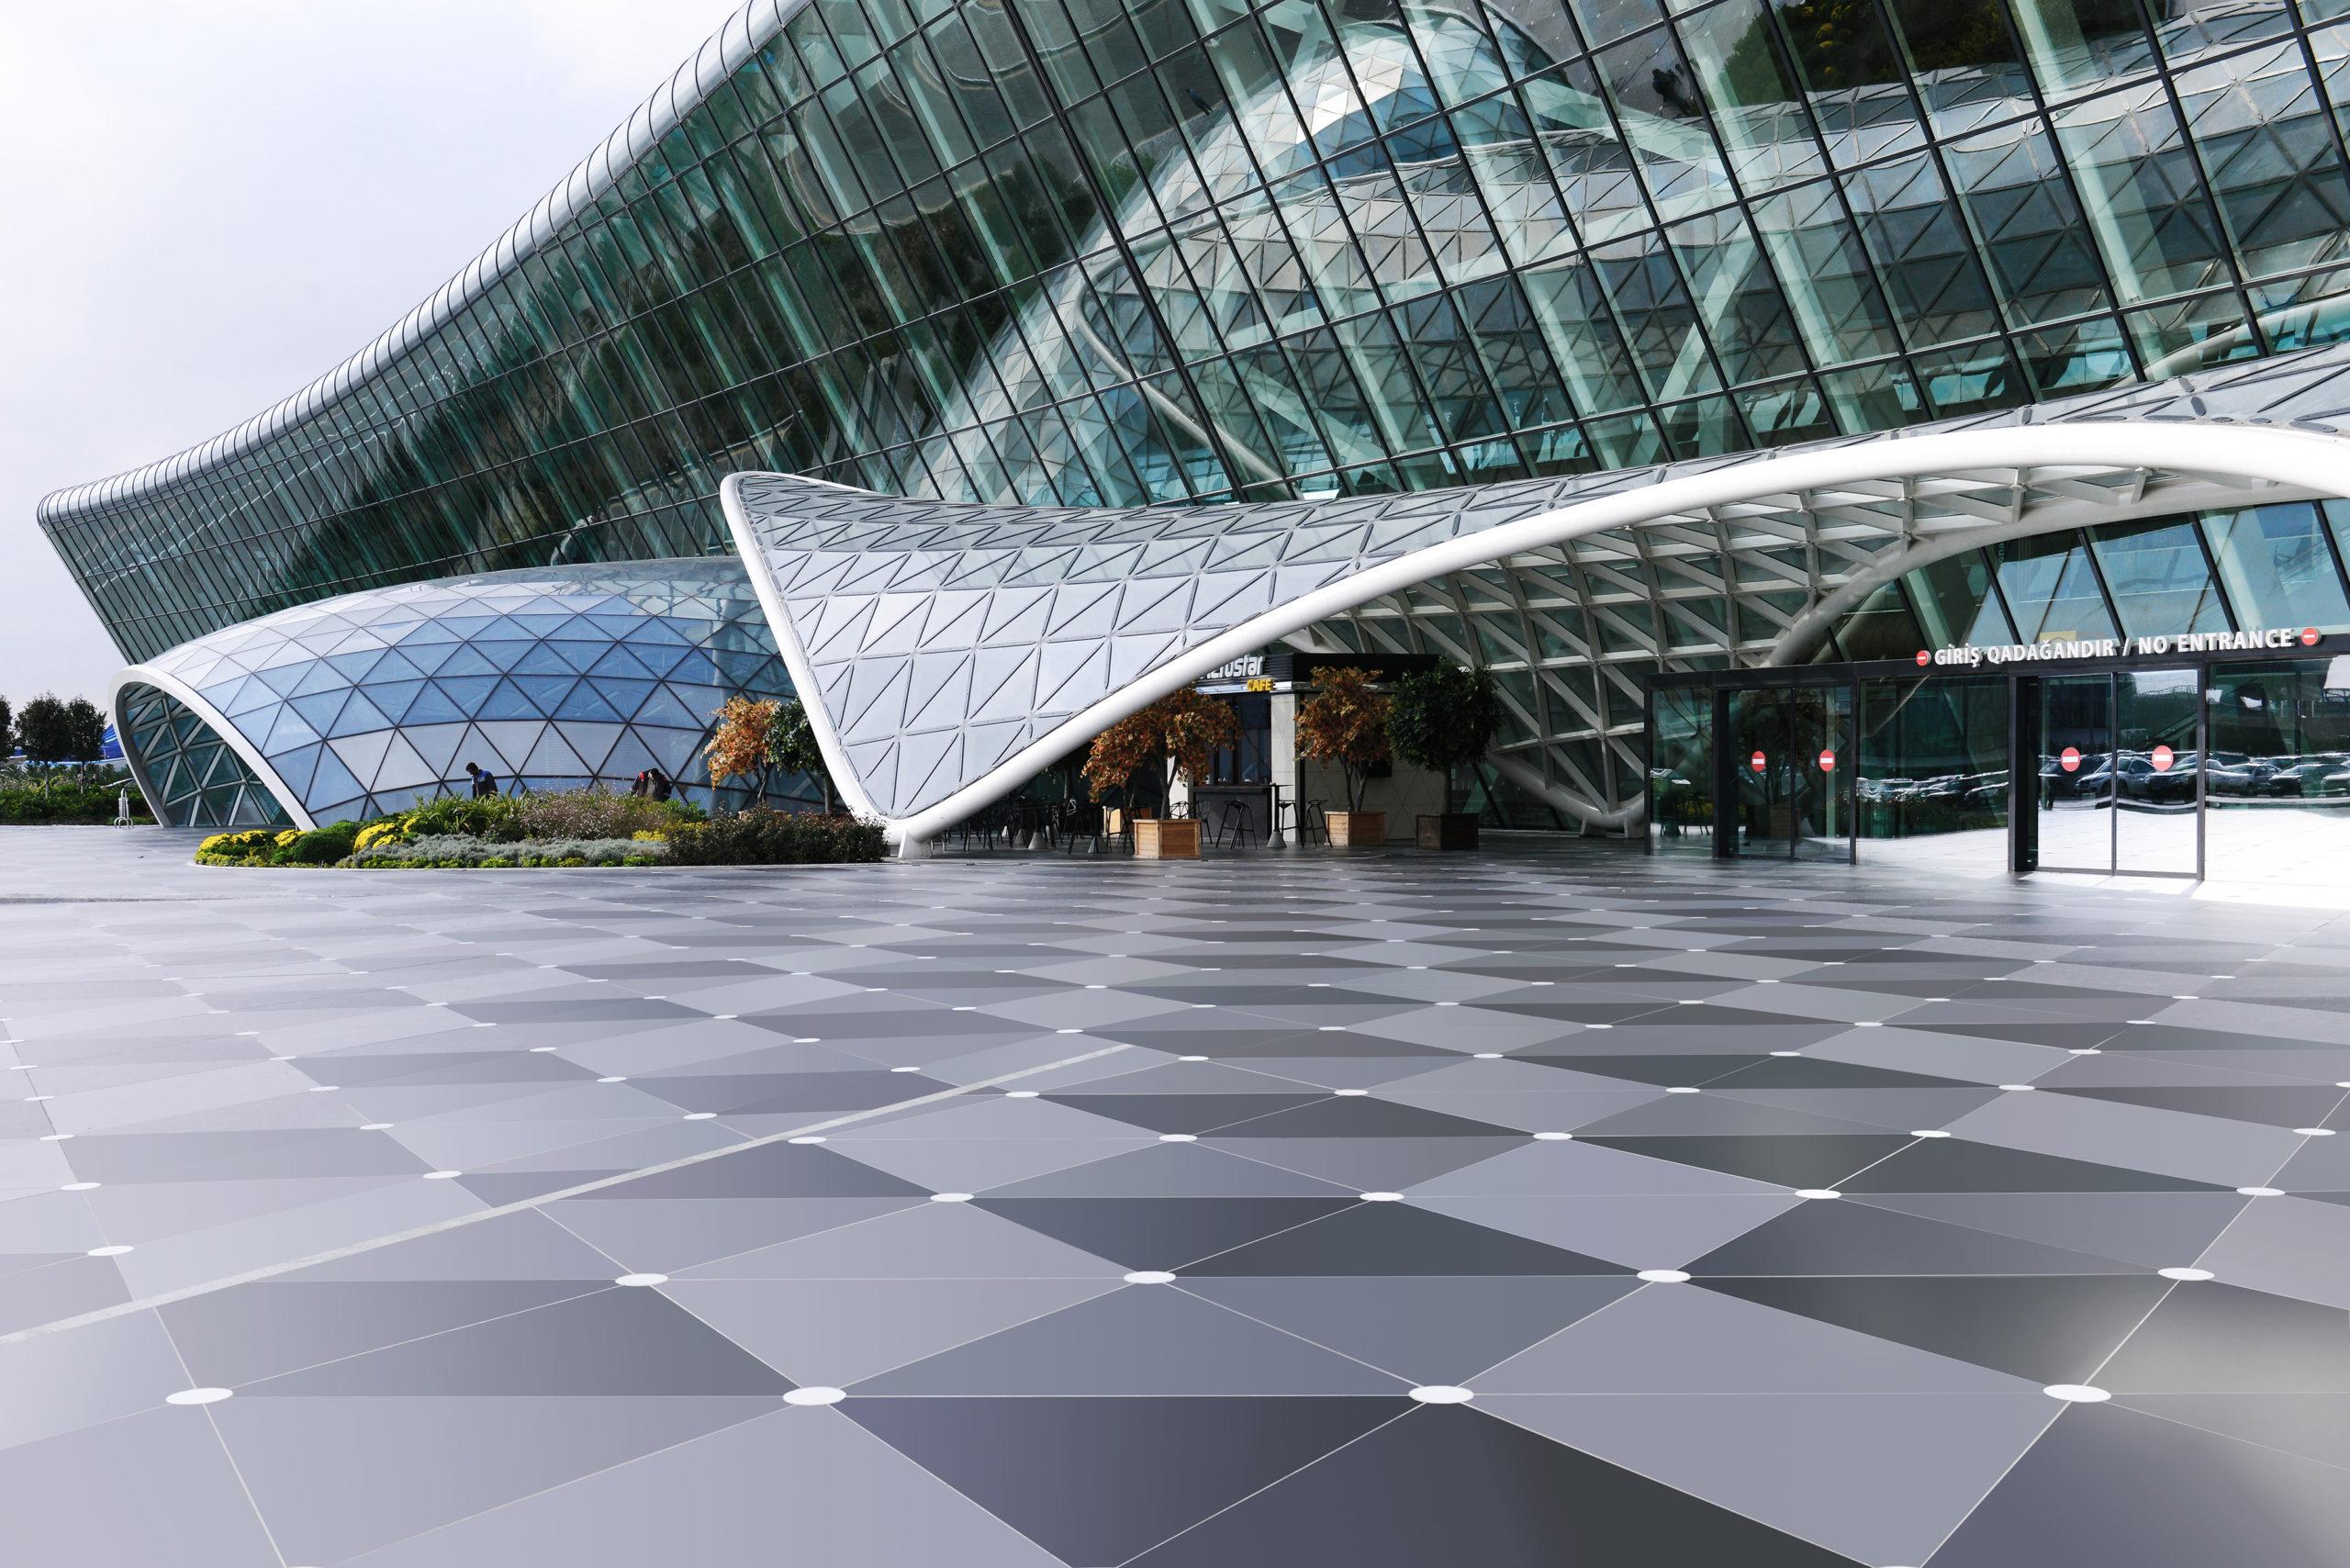 Heydar Aliyev International Airport Baku becomes the most punctual, busiest airport in the region.